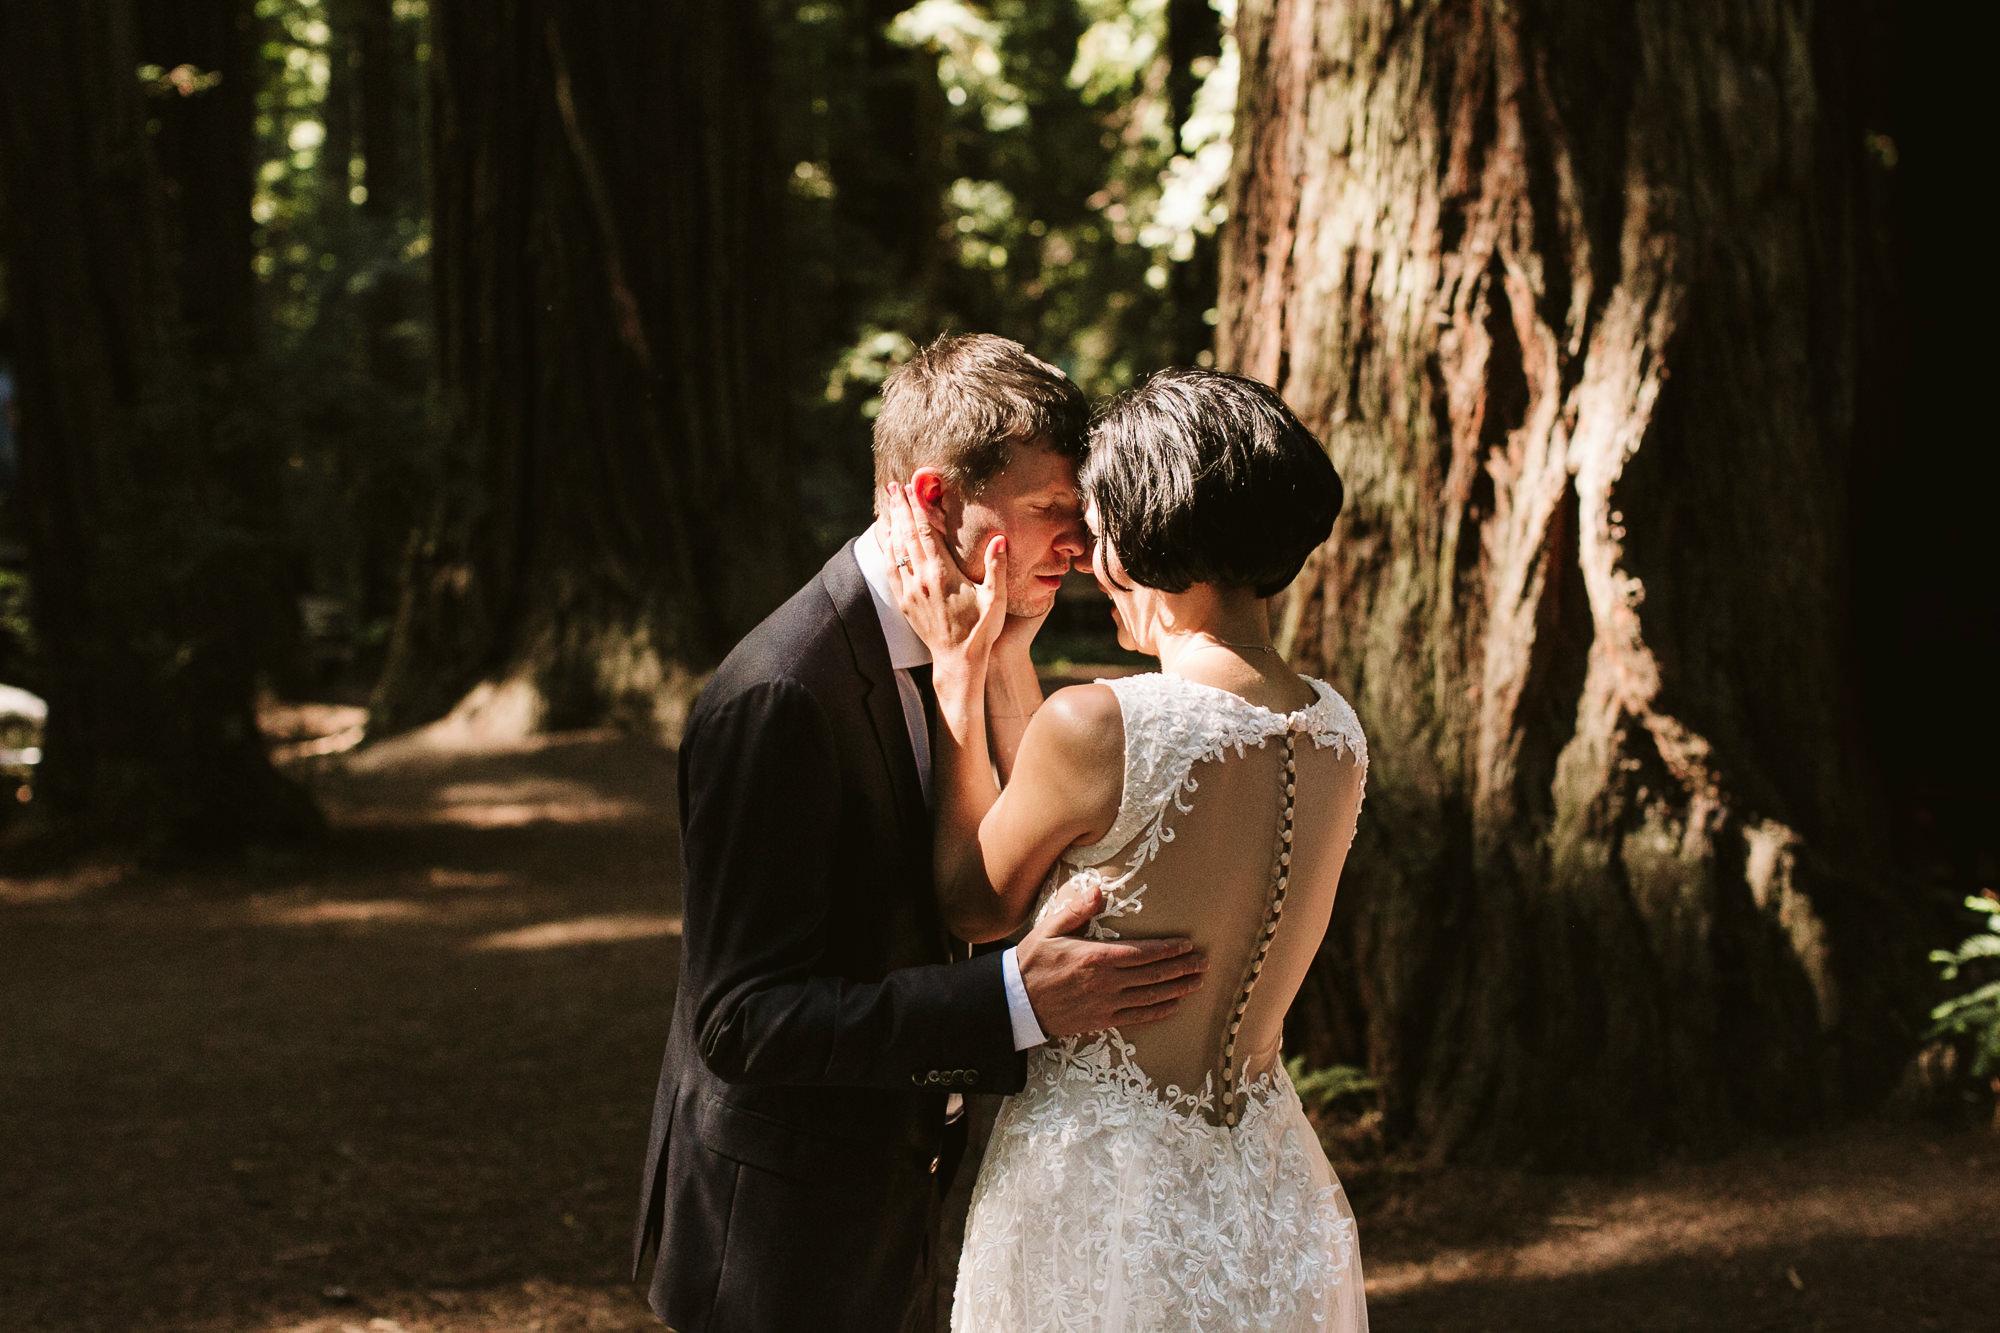 California-wedding-photographer-alfonso-flores-pamplin-groove-241.jpg